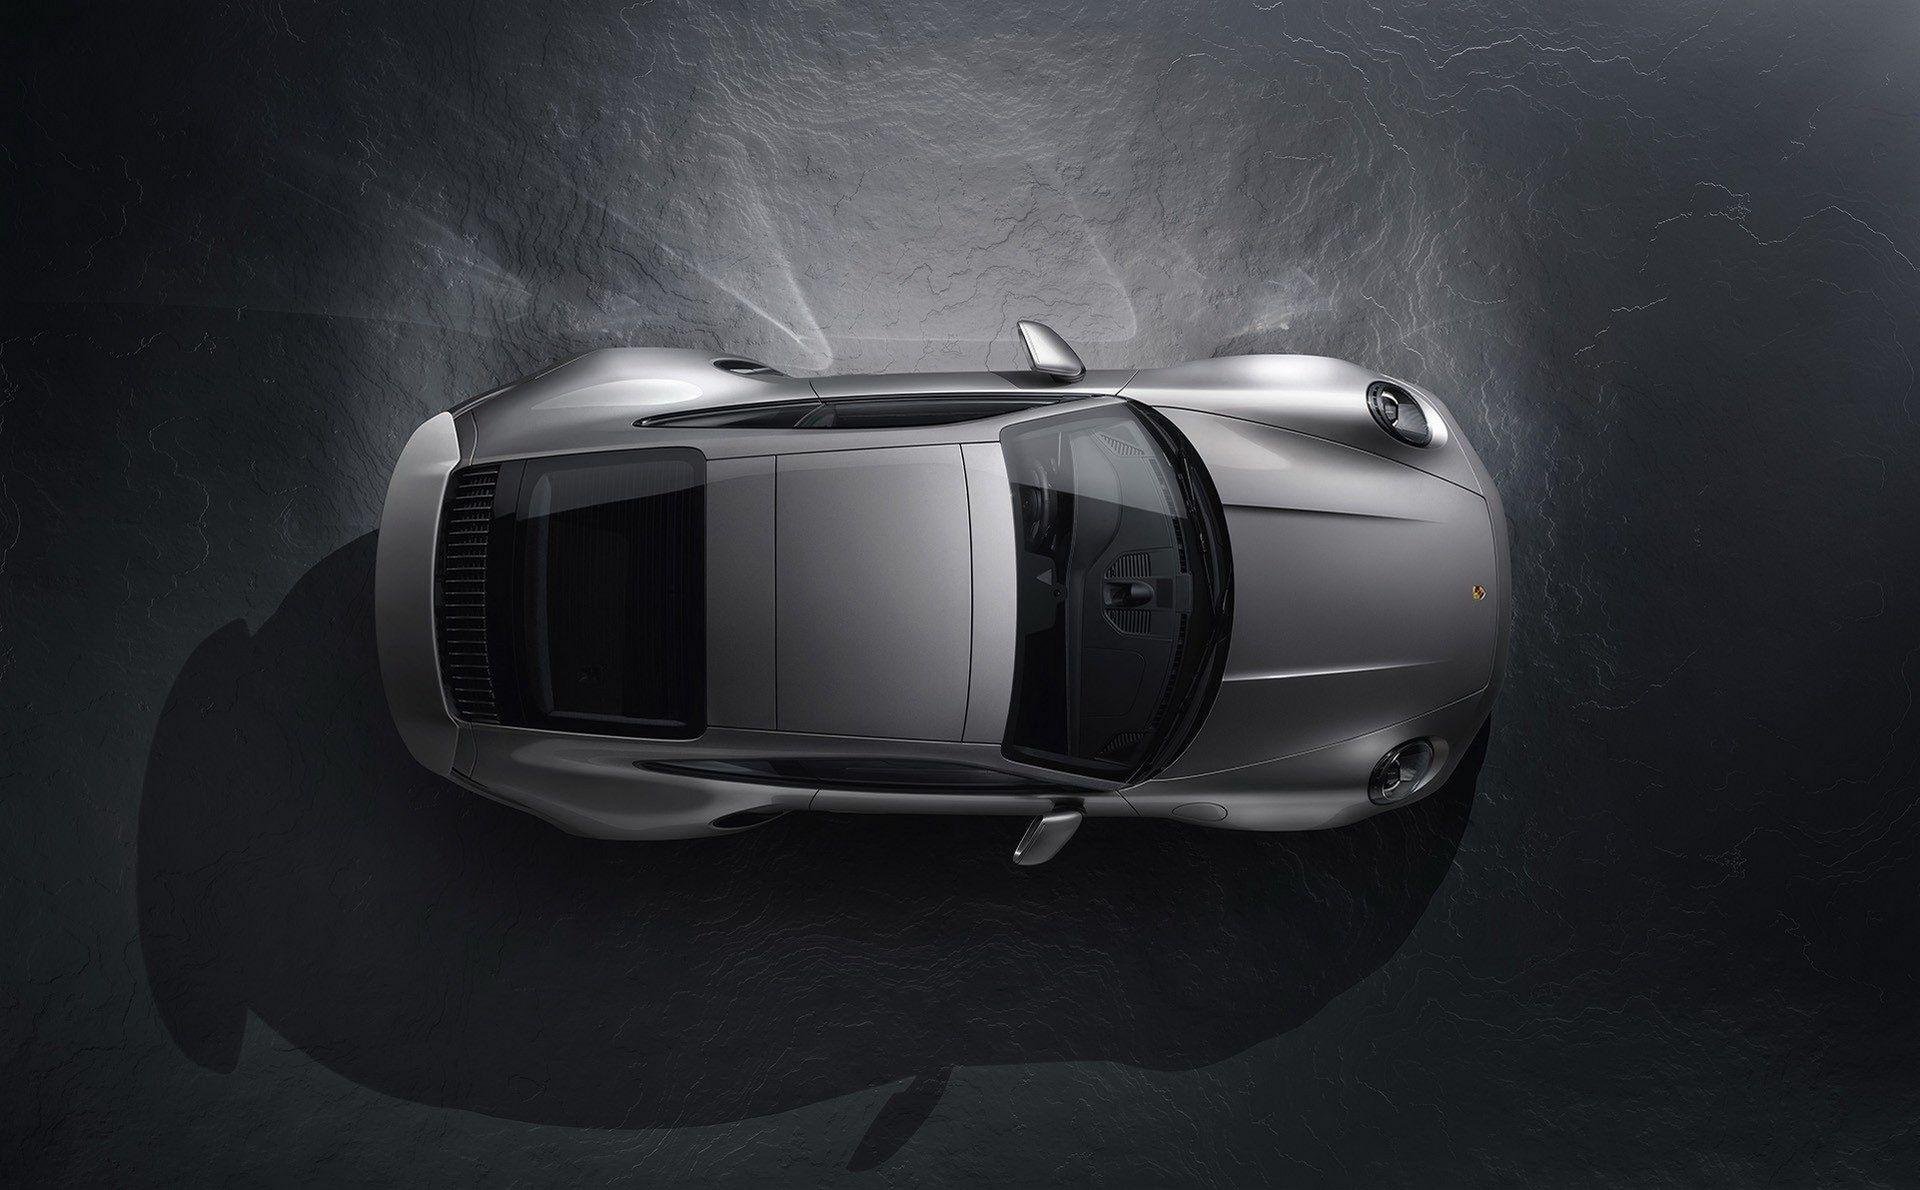 Porsche-911-Turbo-S-2020-31